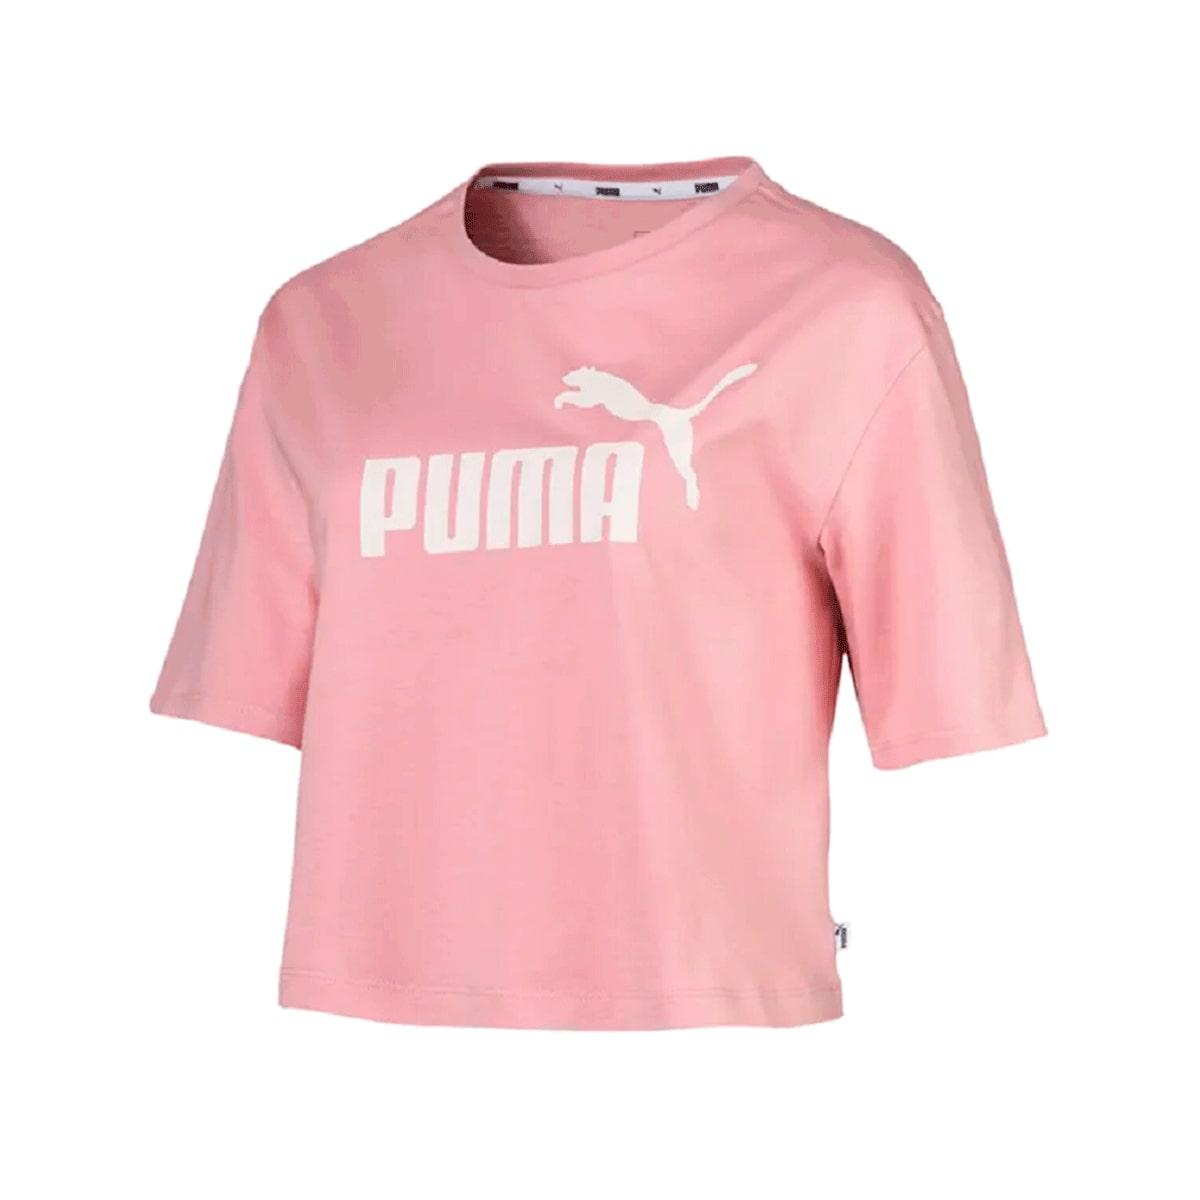 Camiseta Puma Ess Cropped Tee Bridal Feminino Rosa